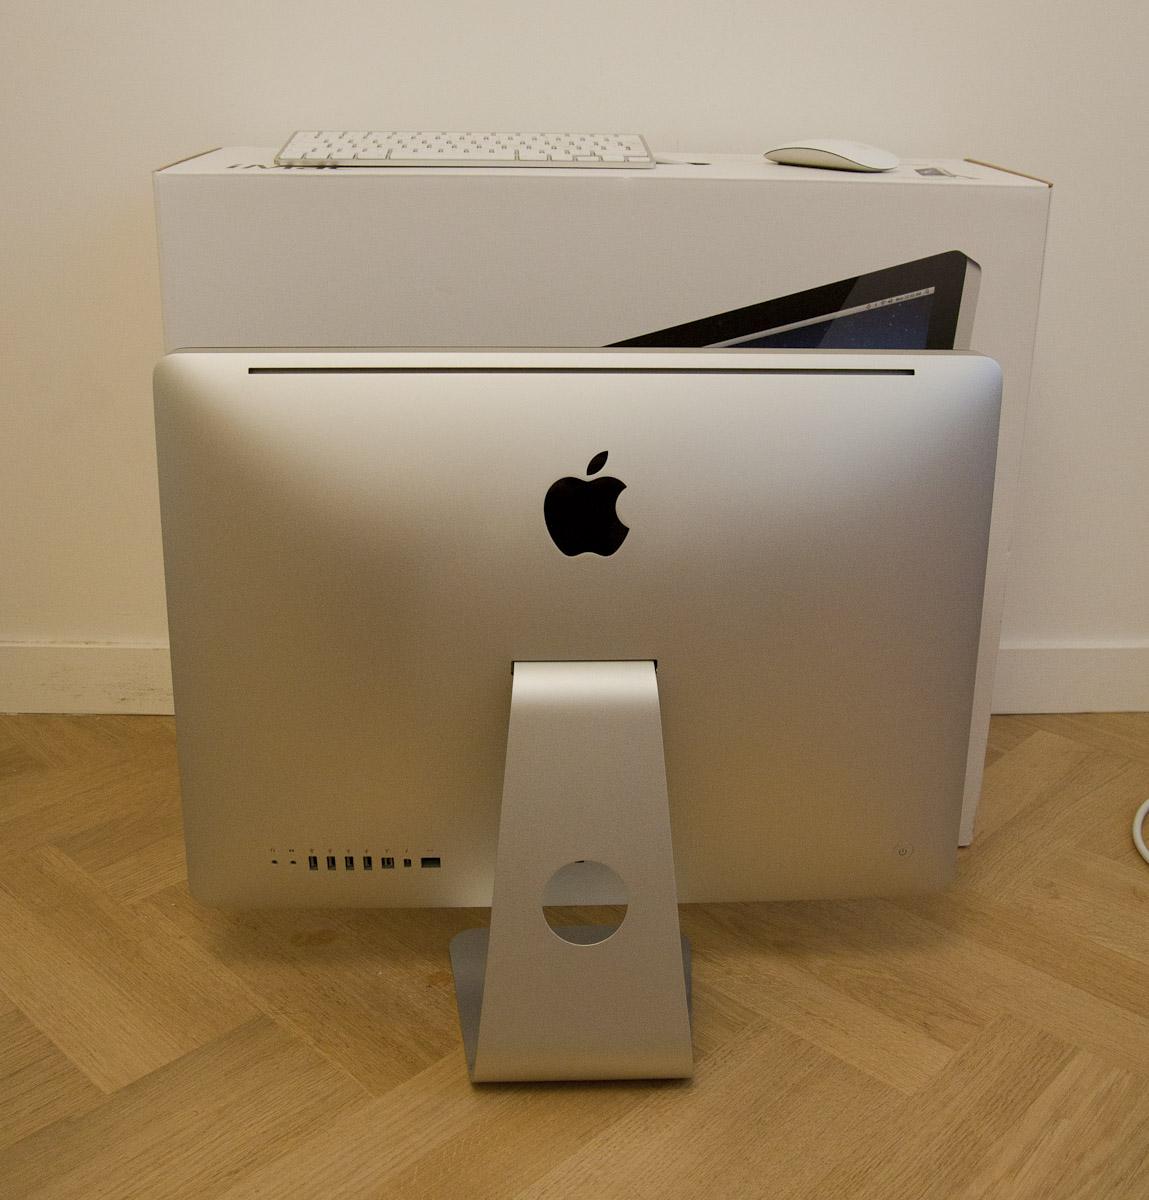 photo apple imac 21 5 i5 2 5ghz quadcore apple imac 21 5 i5 2 5ghz quadcore 466439. Black Bedroom Furniture Sets. Home Design Ideas